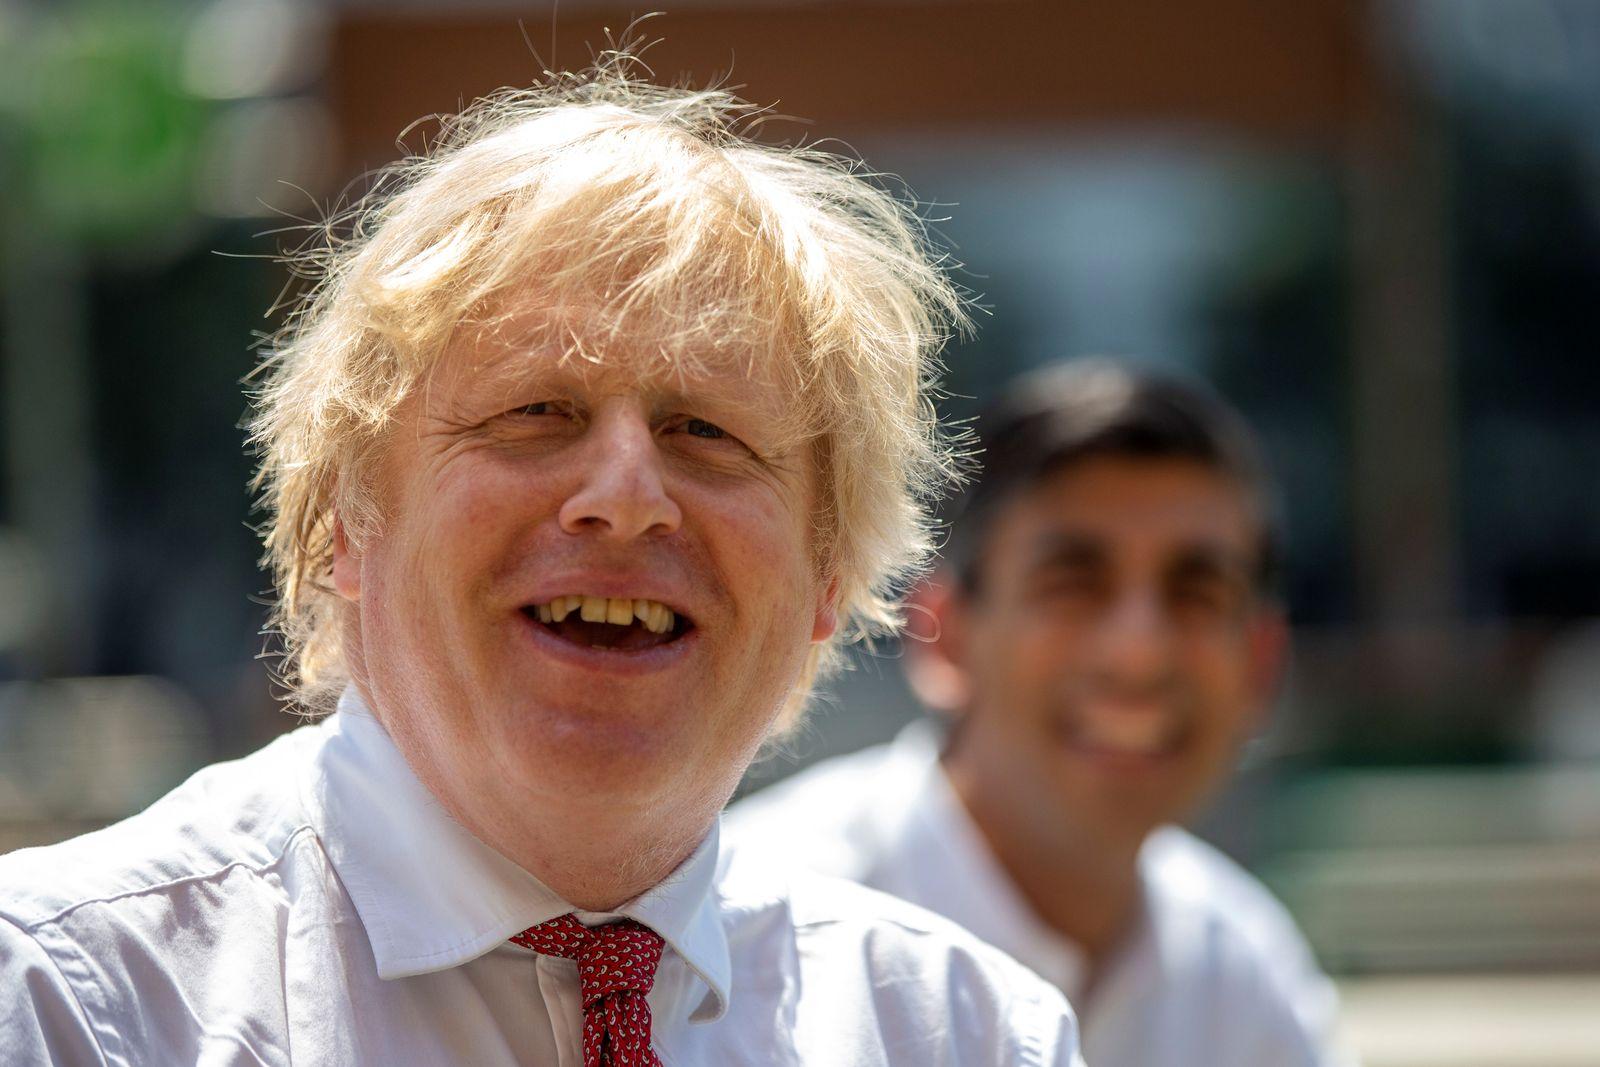 Britain's Prime Minister Boris Johnson and Chancellor Rishi Sunak visit Pizza Pilgrims in West India Quay, in London